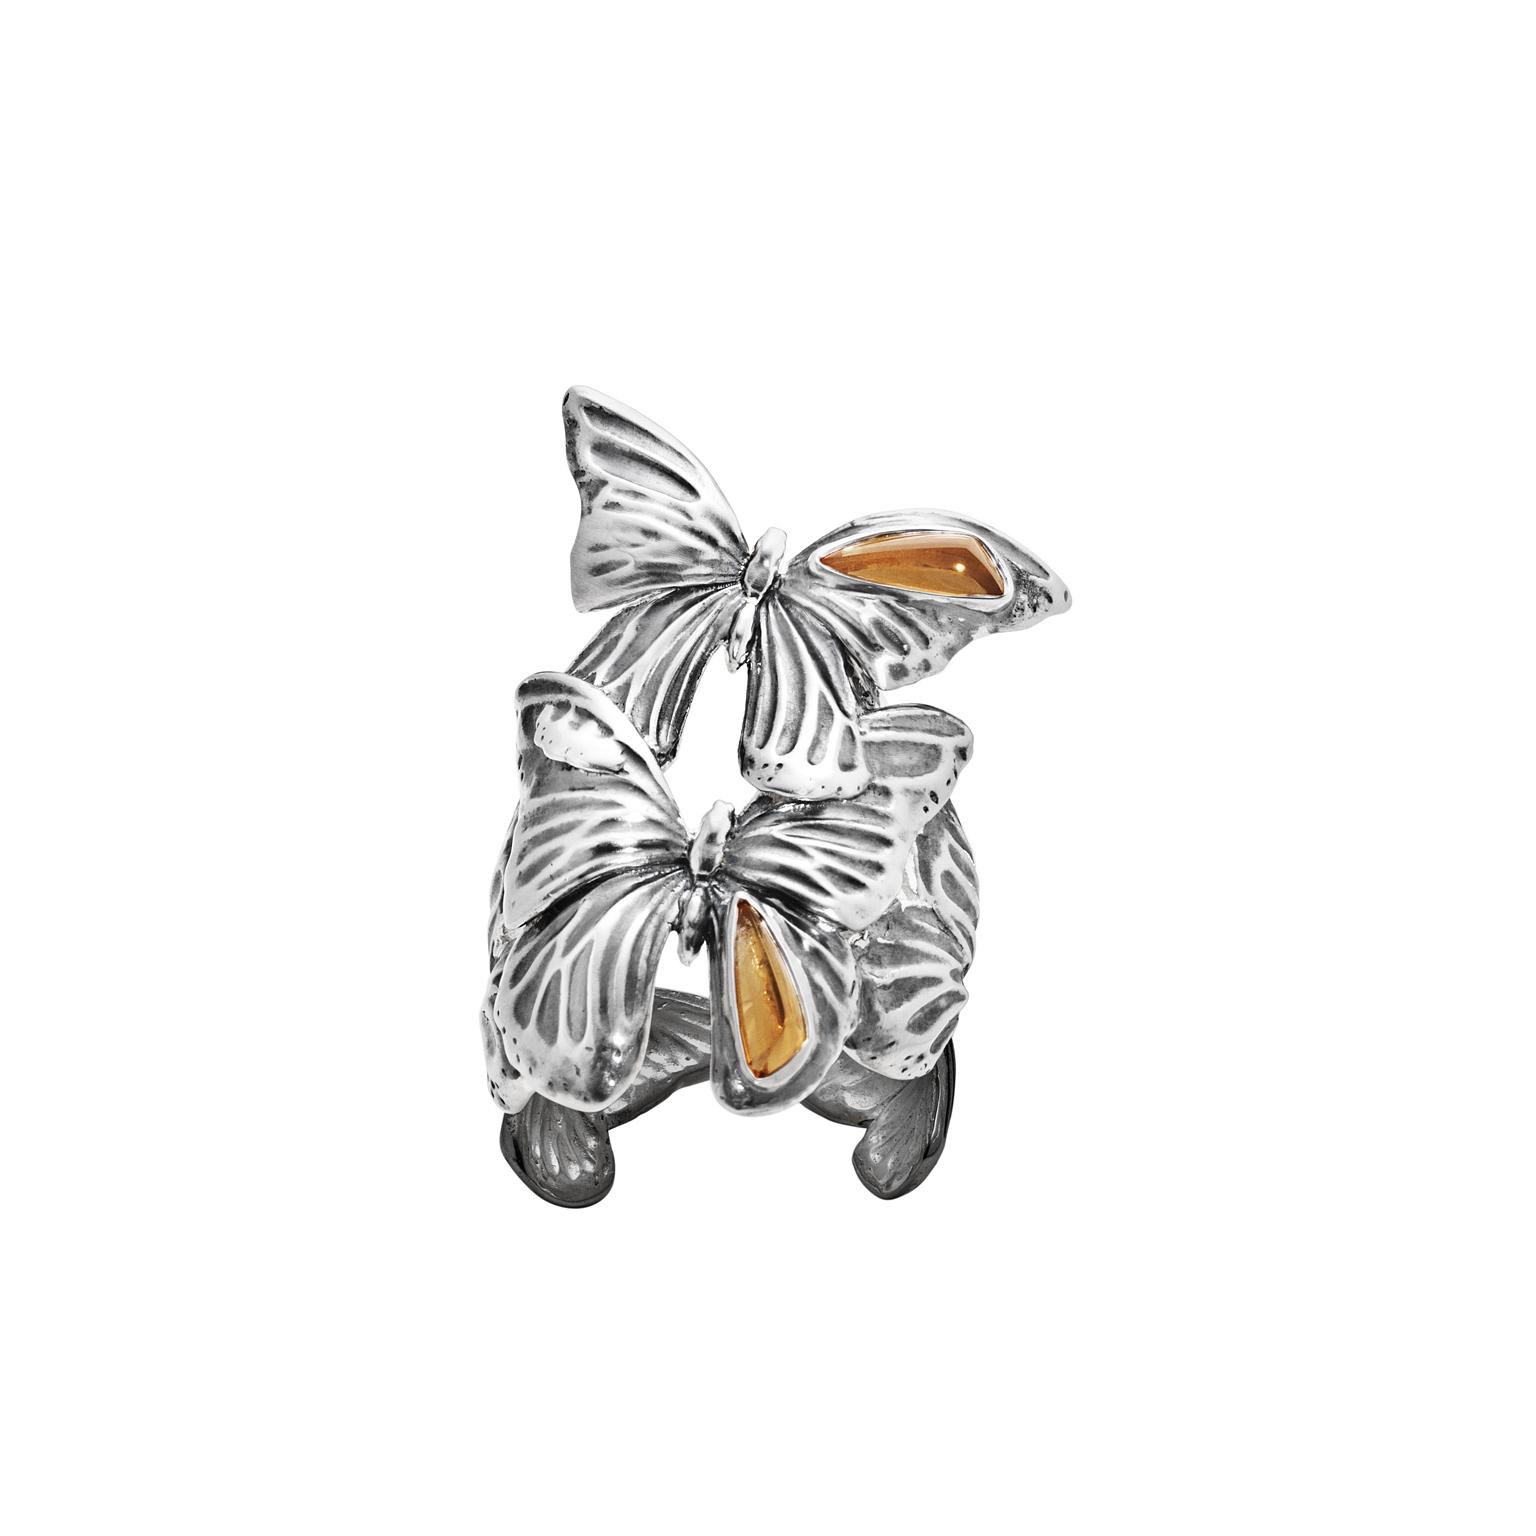 ASKILL 戒指 - 氧化純銀,鑲嵌黃晶建議售價22,400